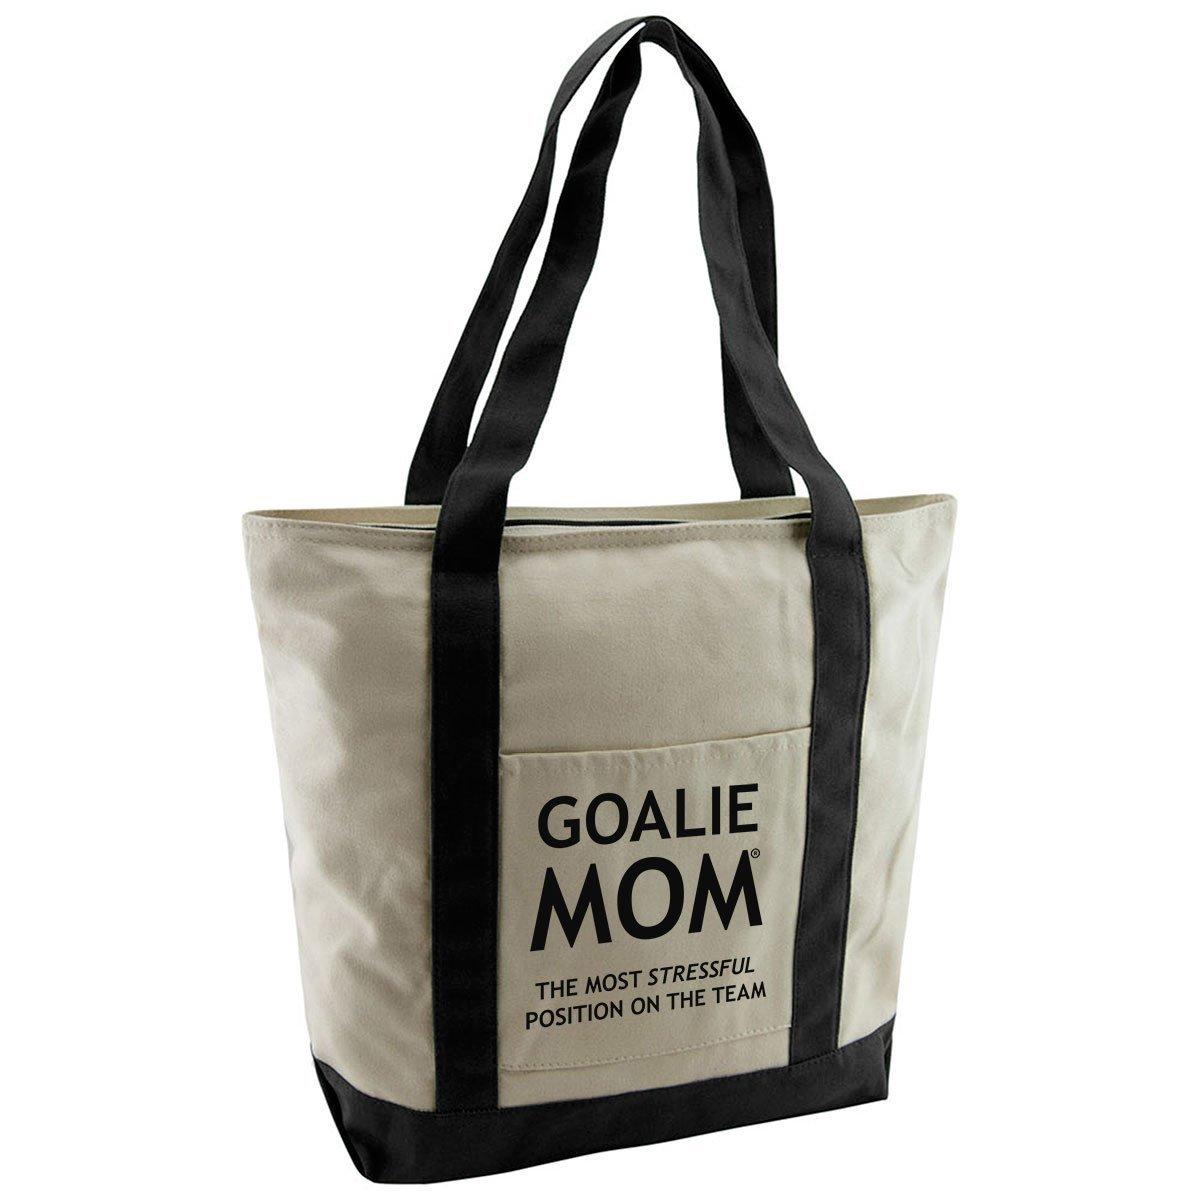 Goalie Mom Cotton Canvas Tote Bag